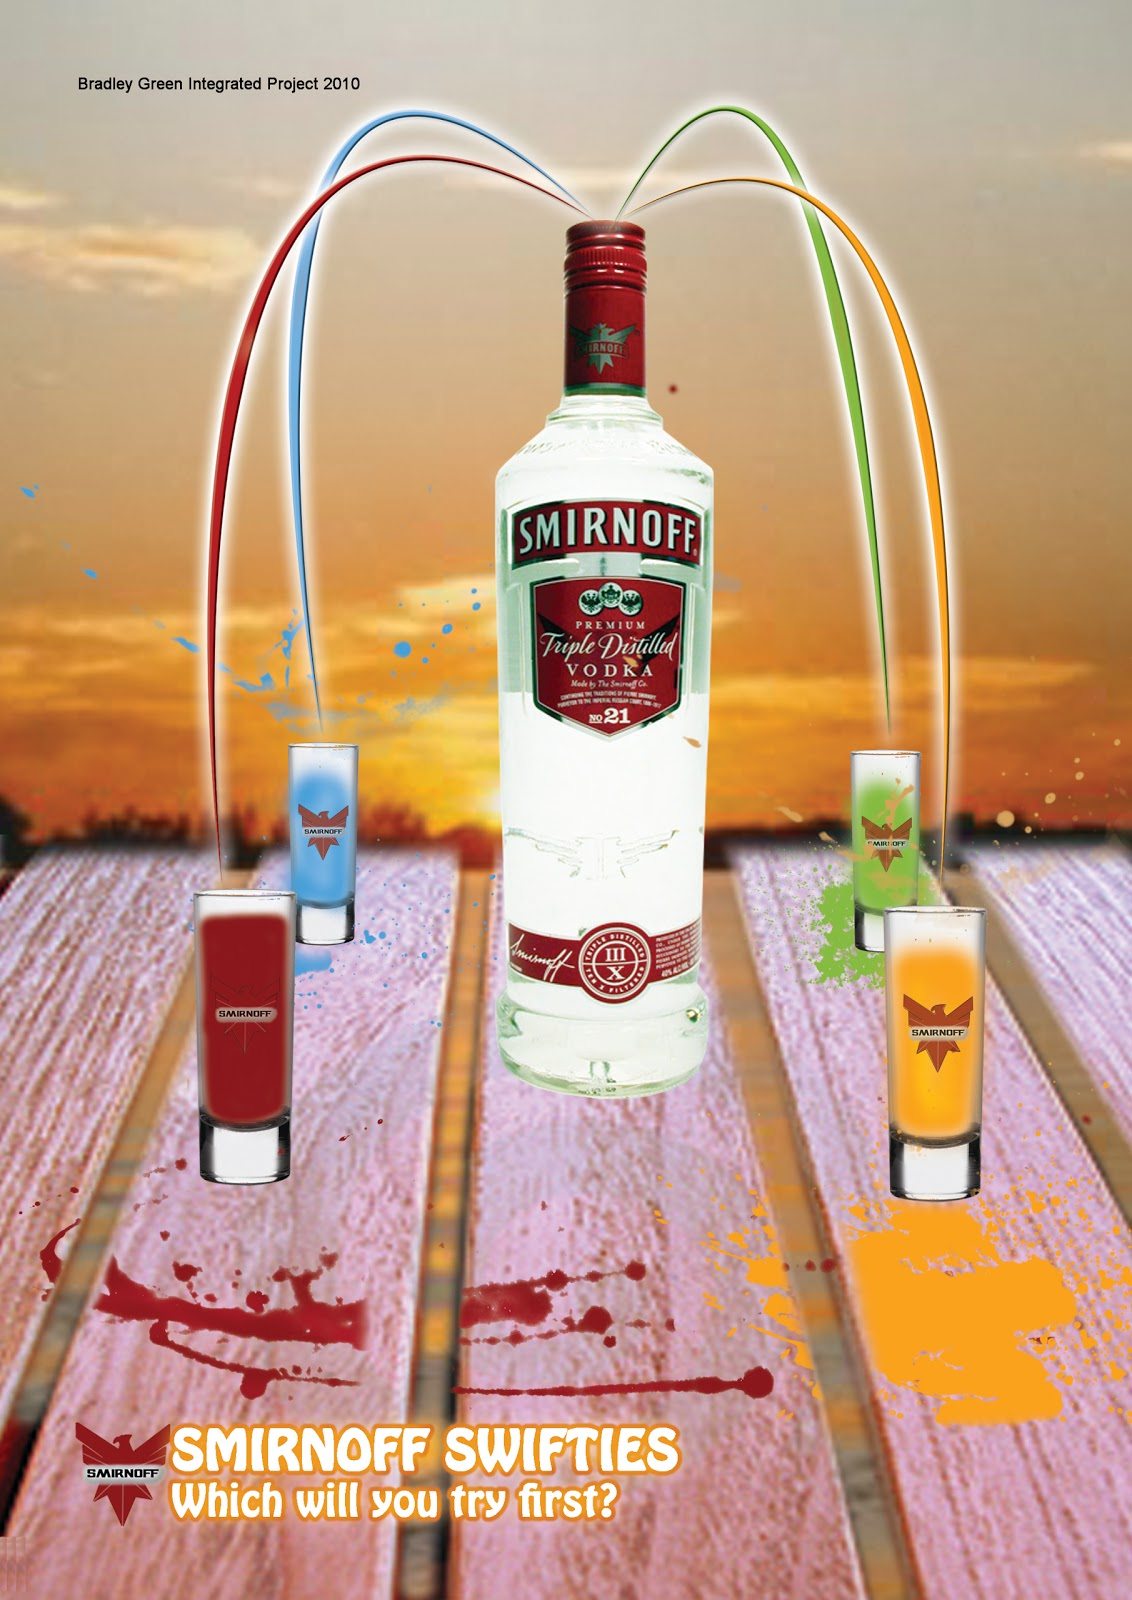 Bradley Green: Smirnoff 'Swifties' advertising poster